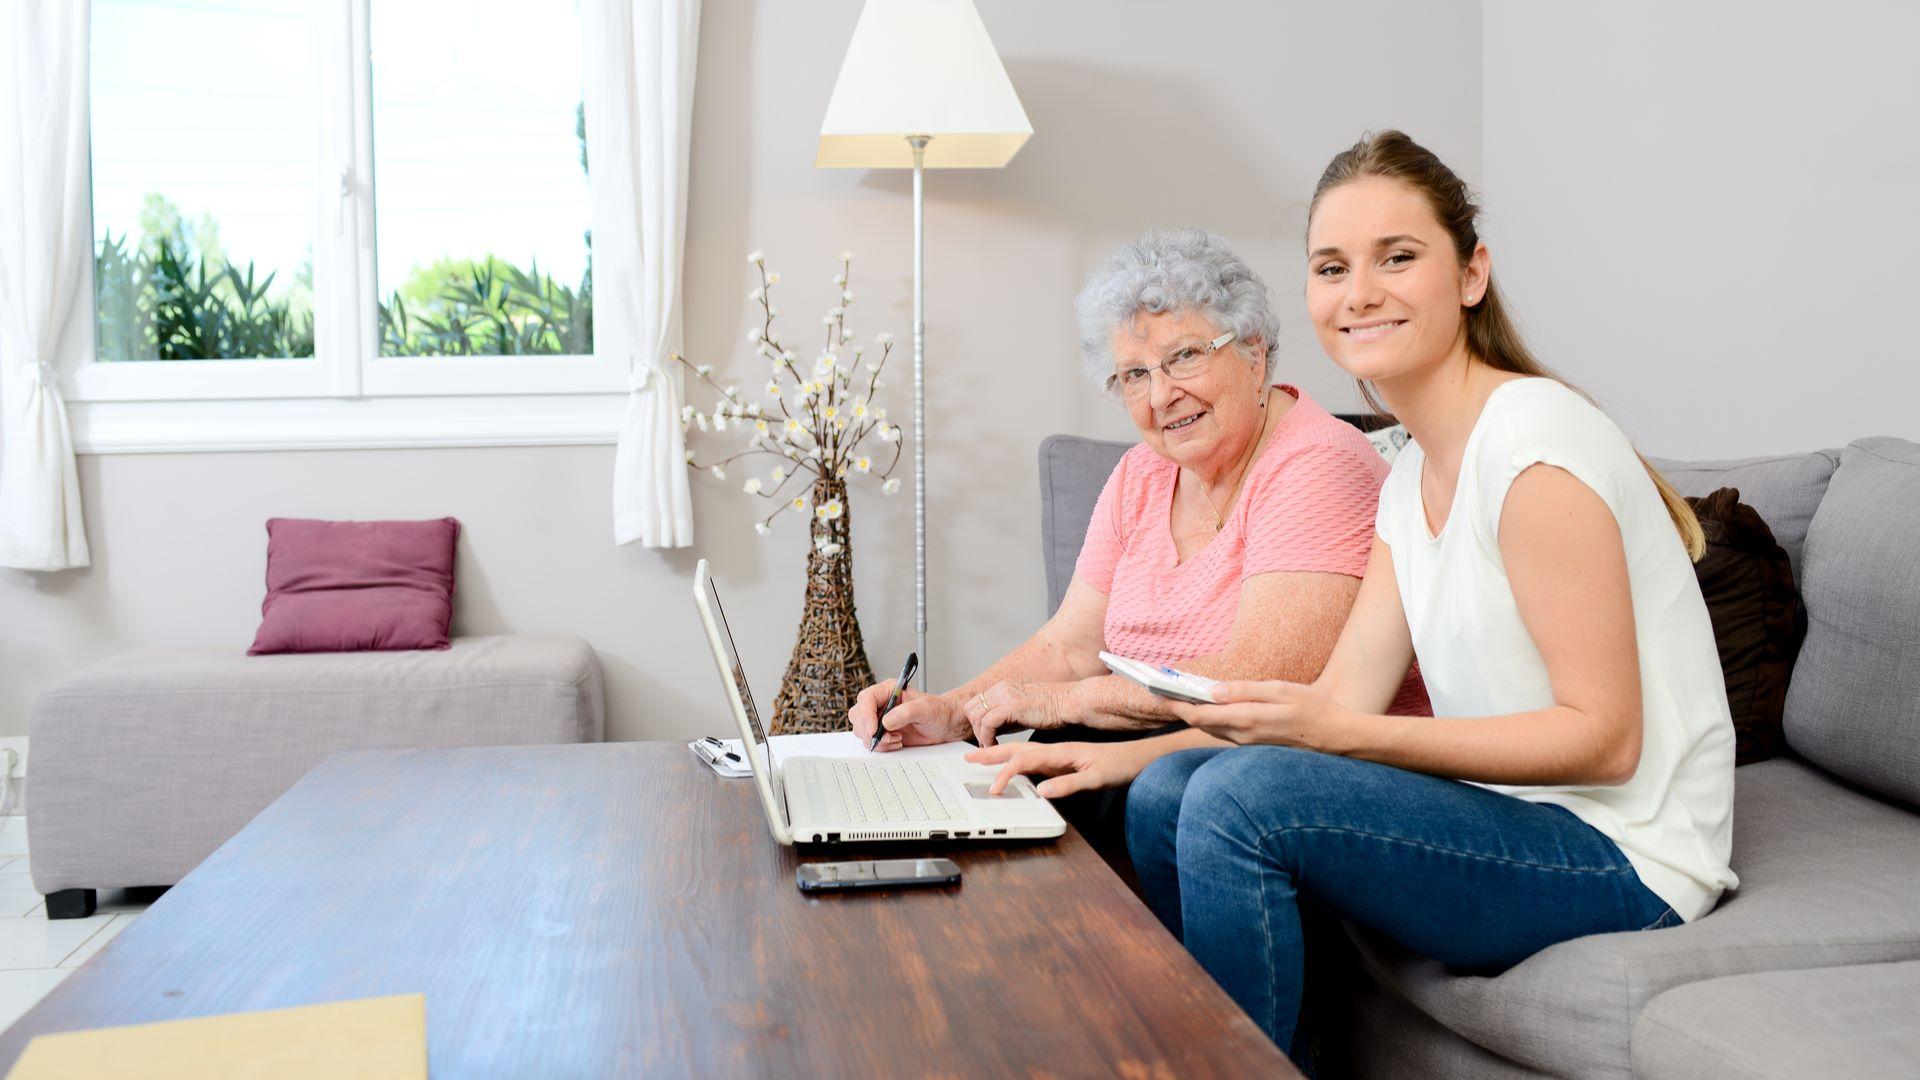 Betrouwbare hulp in de huishouding